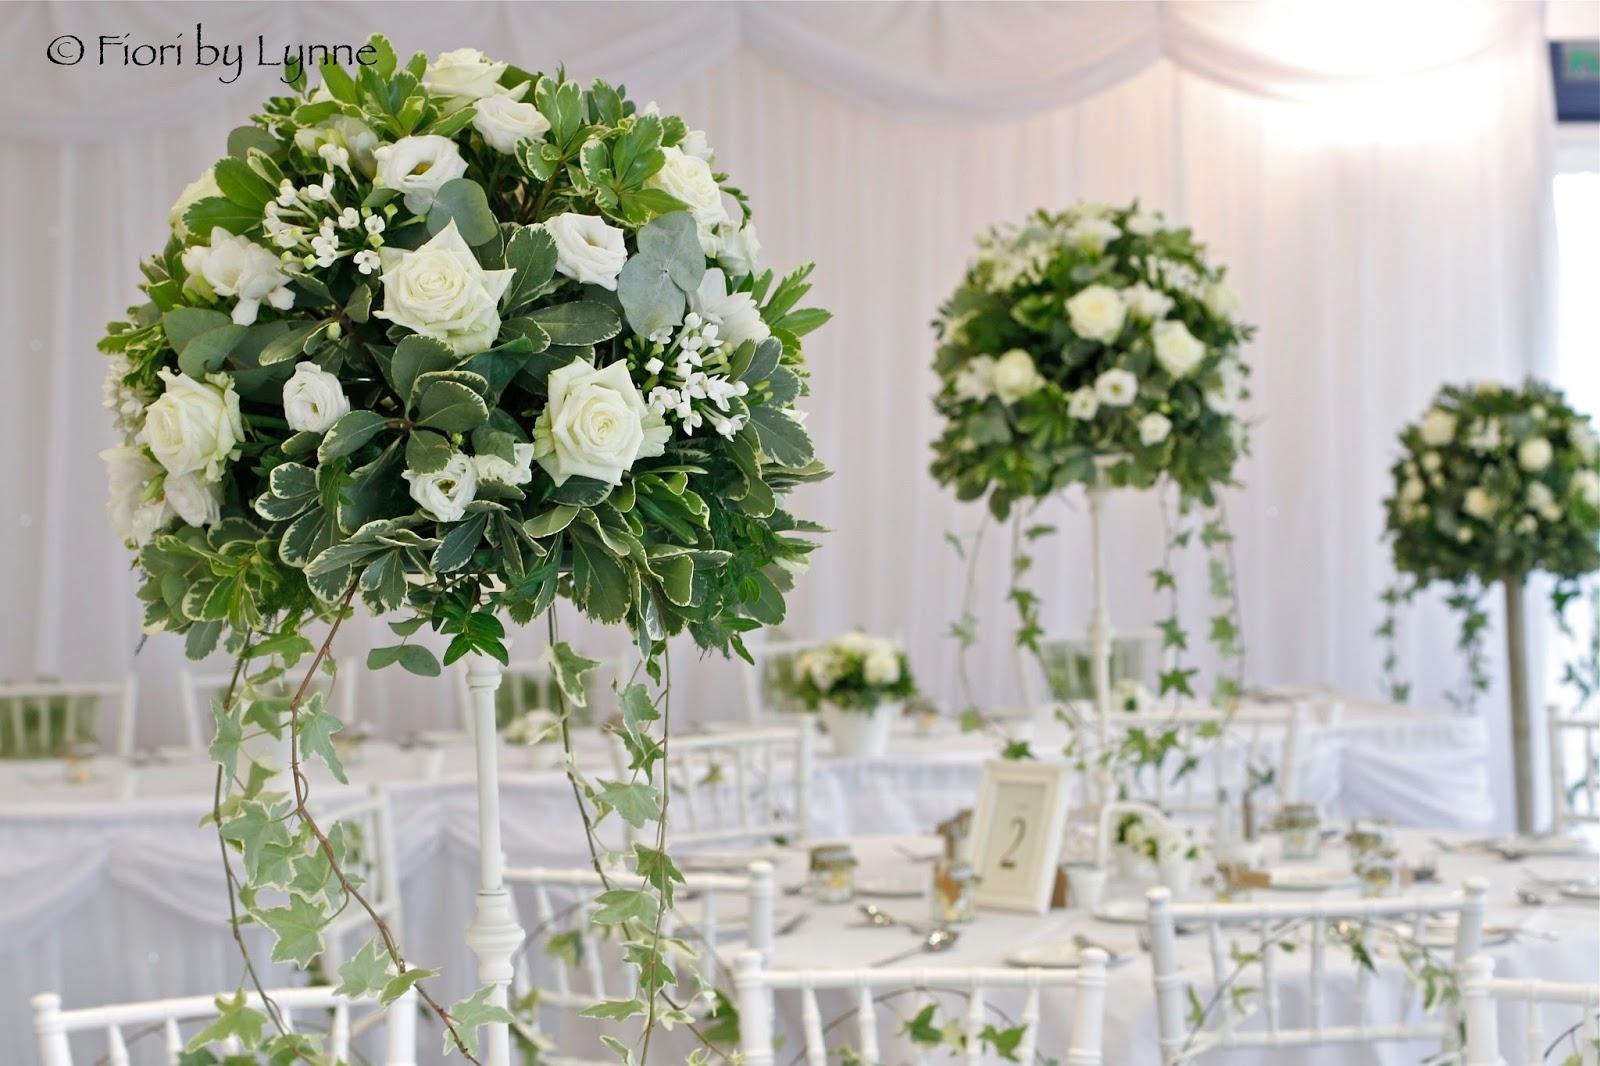 wedding flowers blog rebecca 39 s vintage garden themed wedding flowers chilworth manor. Black Bedroom Furniture Sets. Home Design Ideas